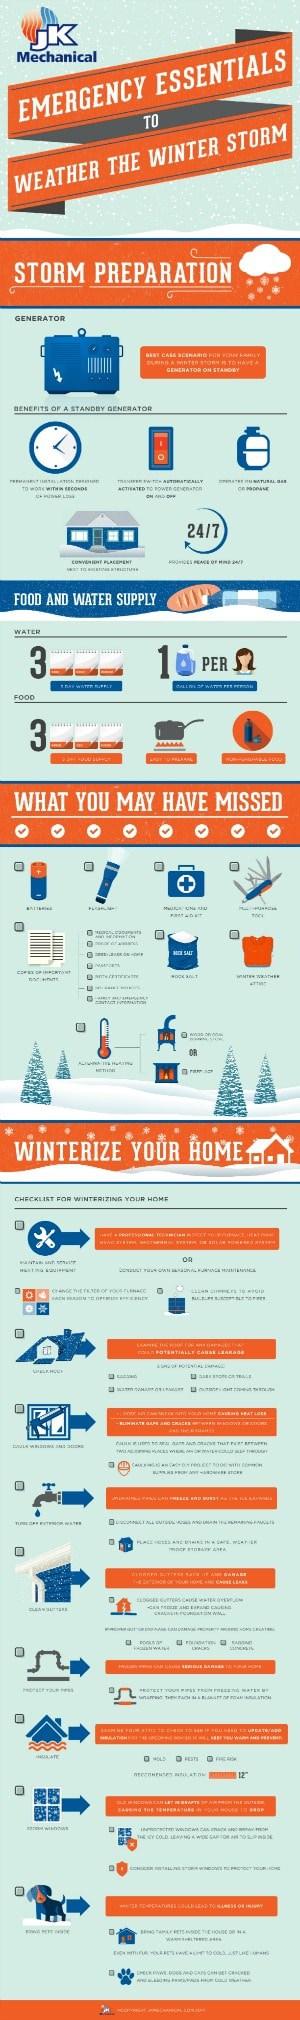 Get ready for winter weather | PreparednessMama